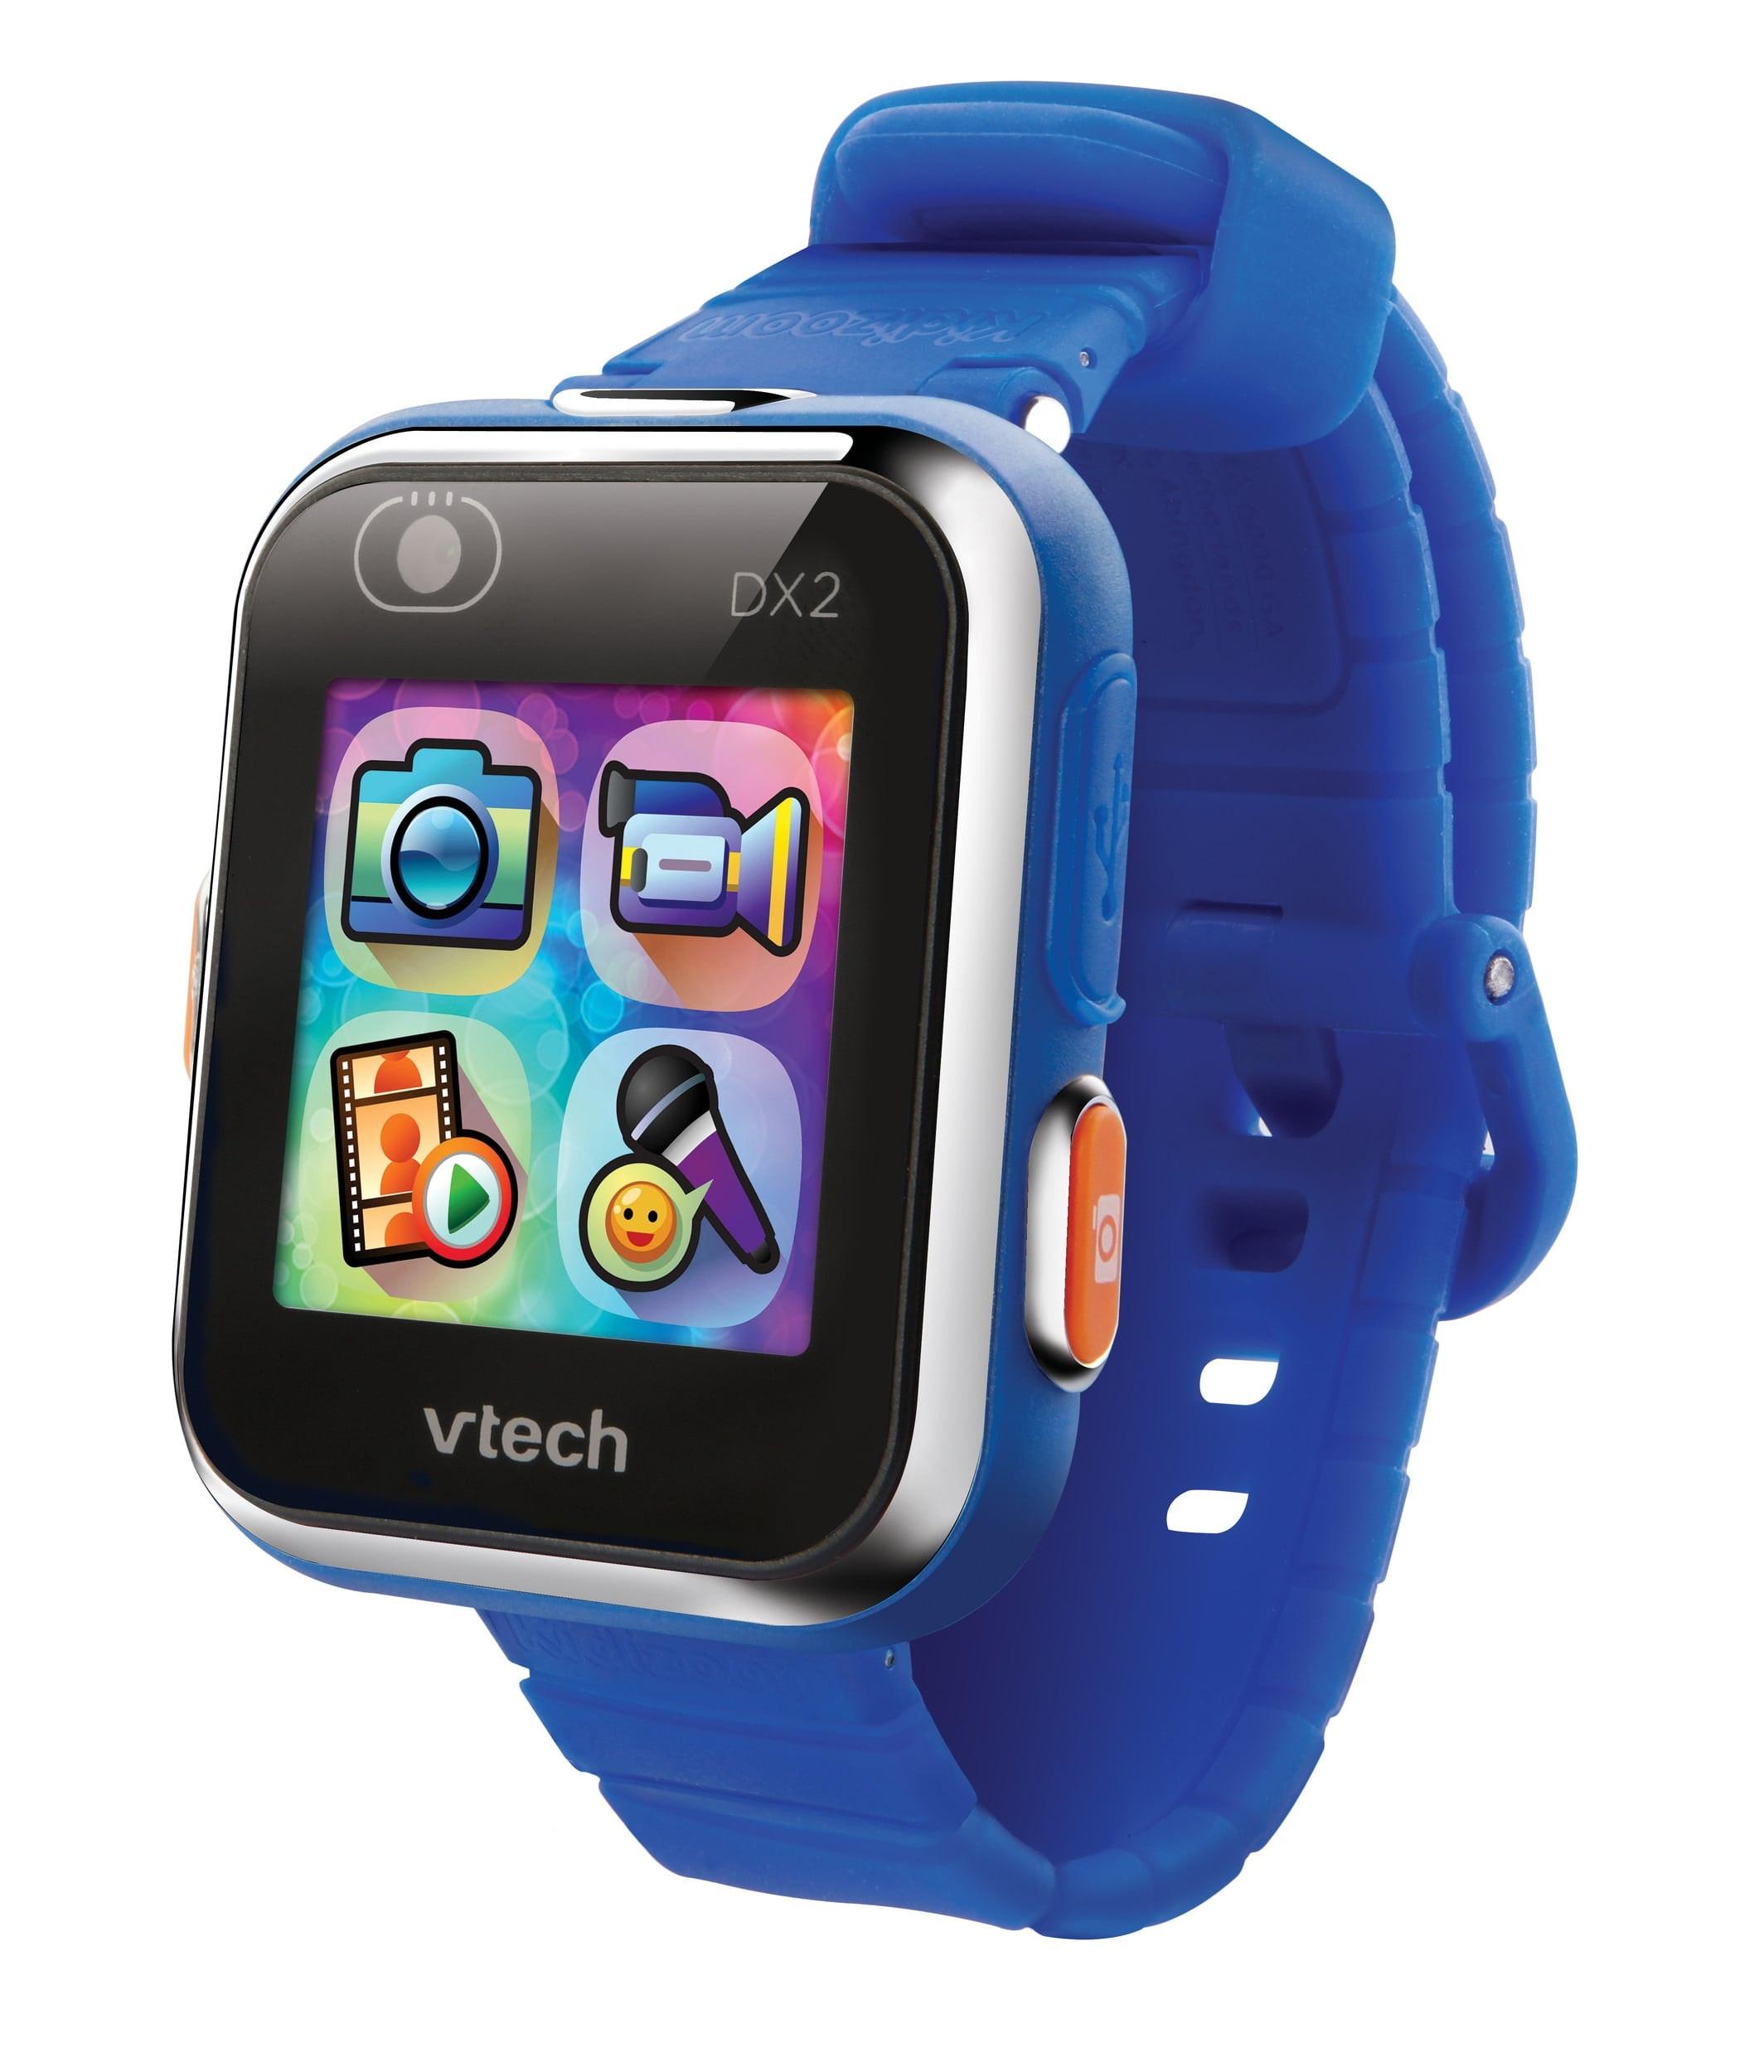 VTech smartwatch Kidizoom DX2 blauw